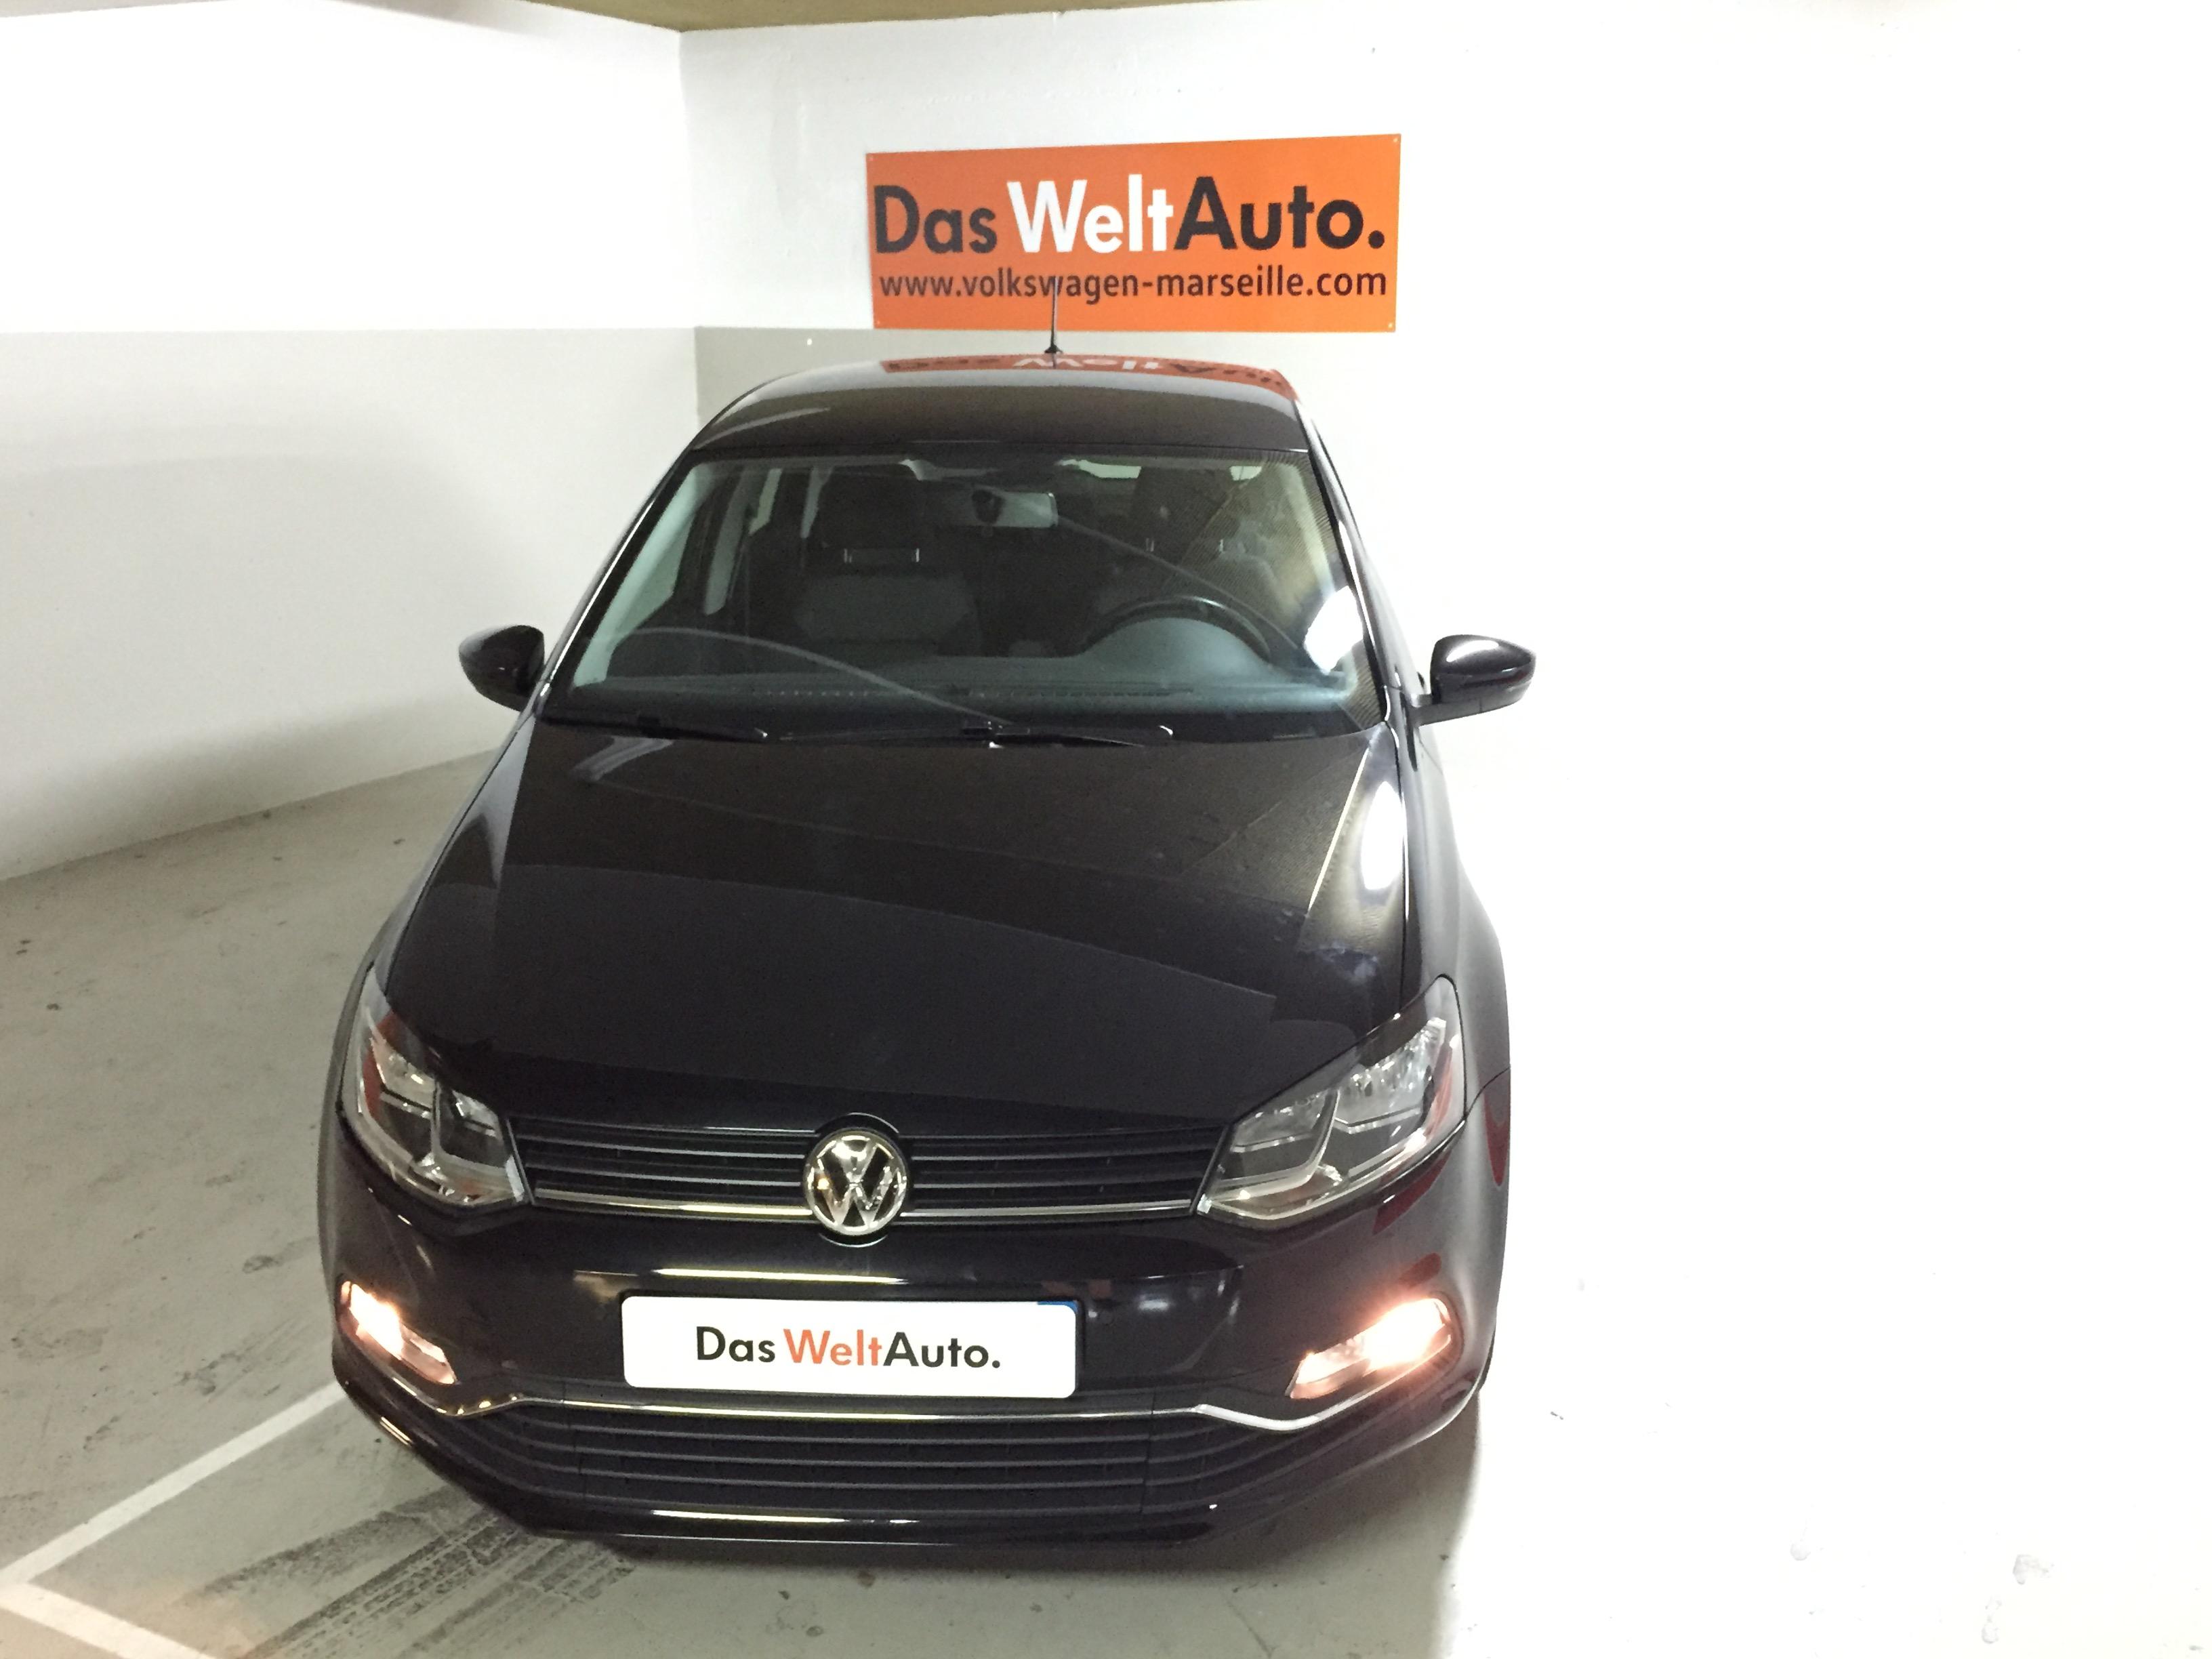 Volkswagen Polo 24977km